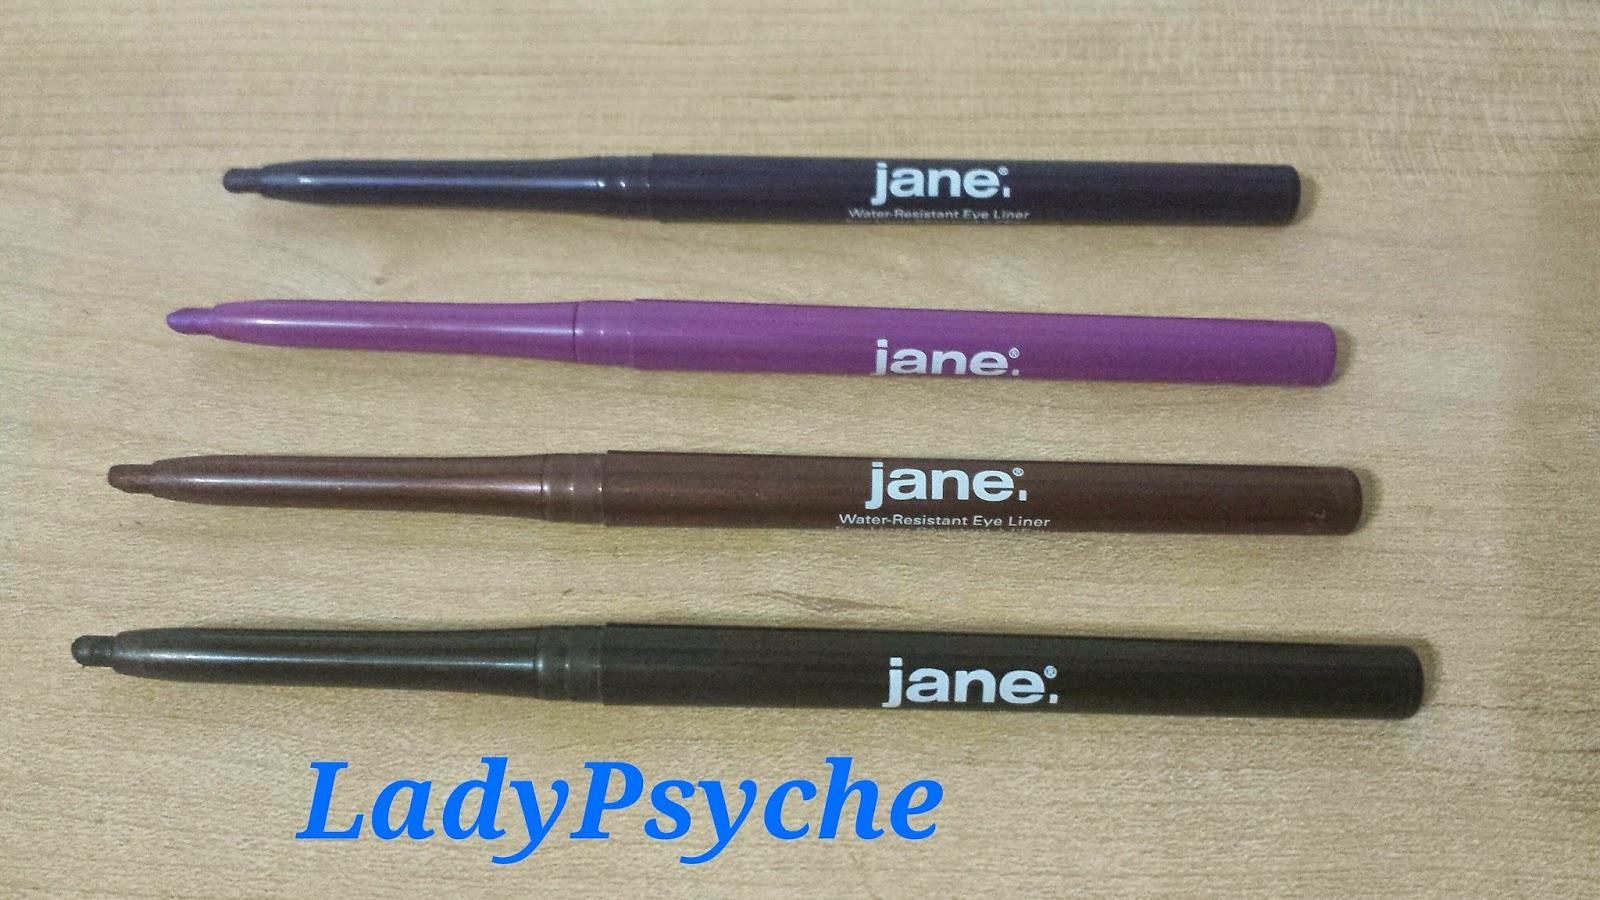 LadyPsyche Makeup & Fashion: Jane Cosmetics Eyes That Inspire ...